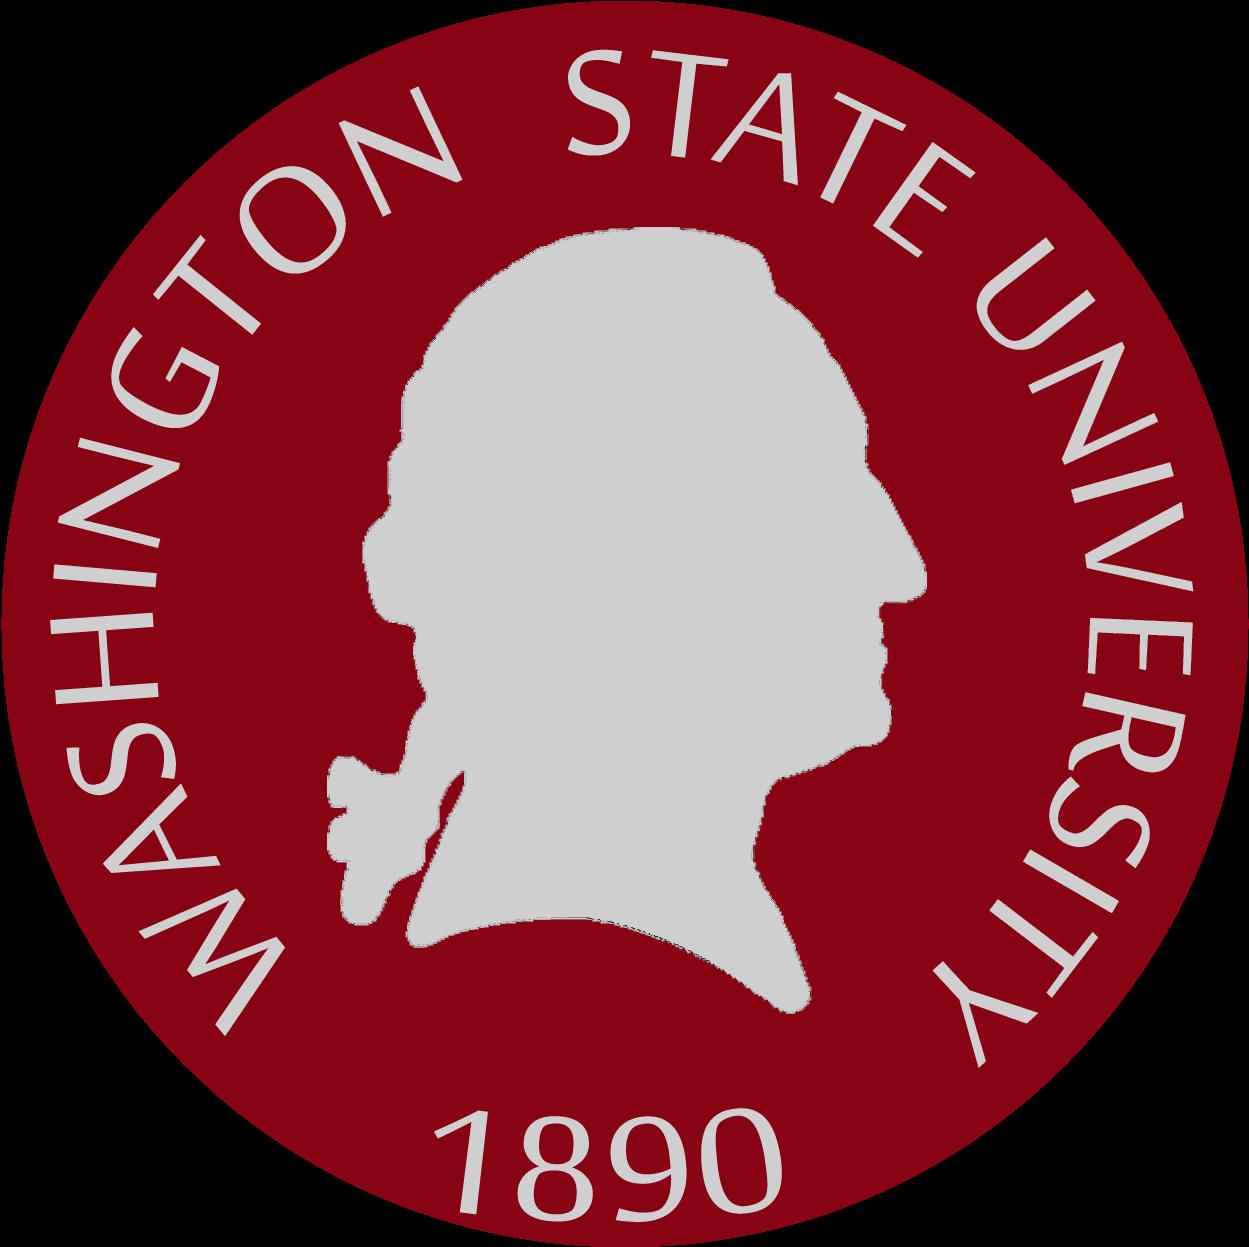 Washington State Png - Washington State University Seal Clipart (1296x1296), Png Download